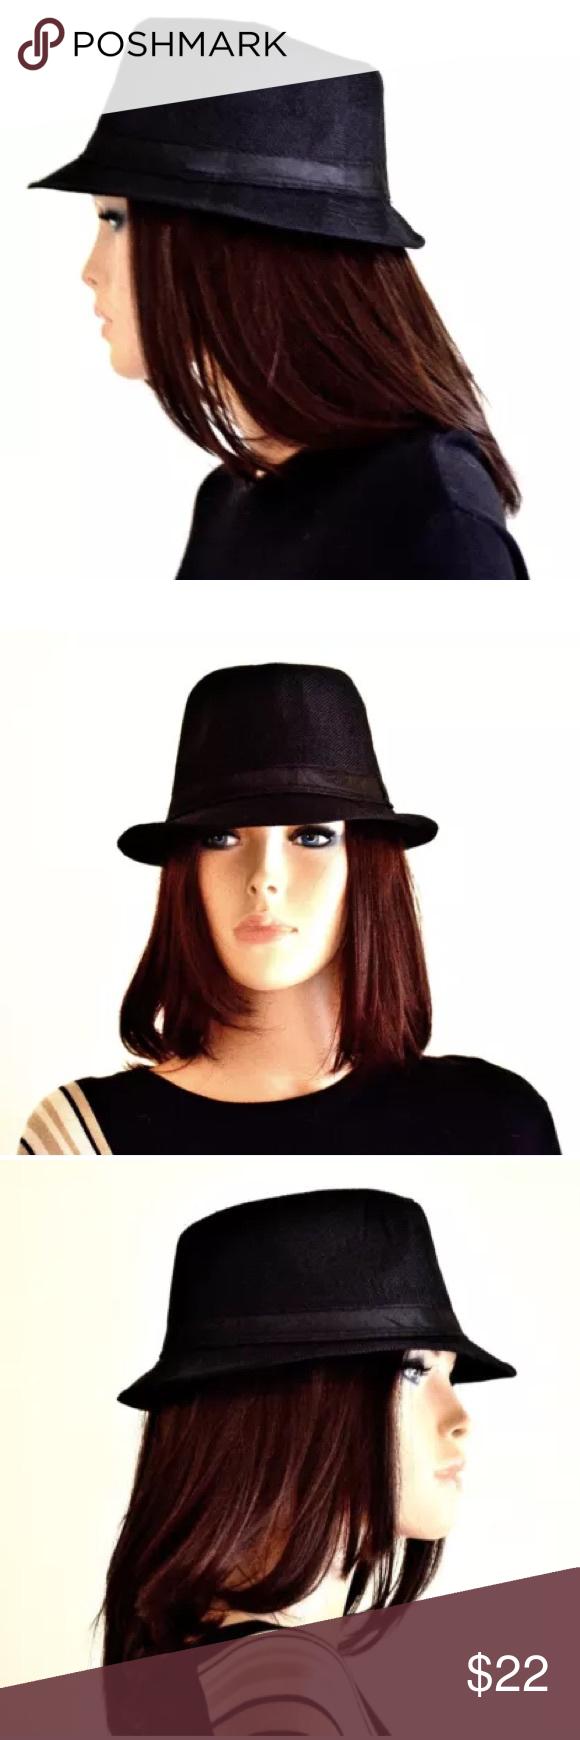 Fedora Hats Straw Hats Panama Hat Gangster Hat Ladies Dress Hats Hats Vintage Straw Hat